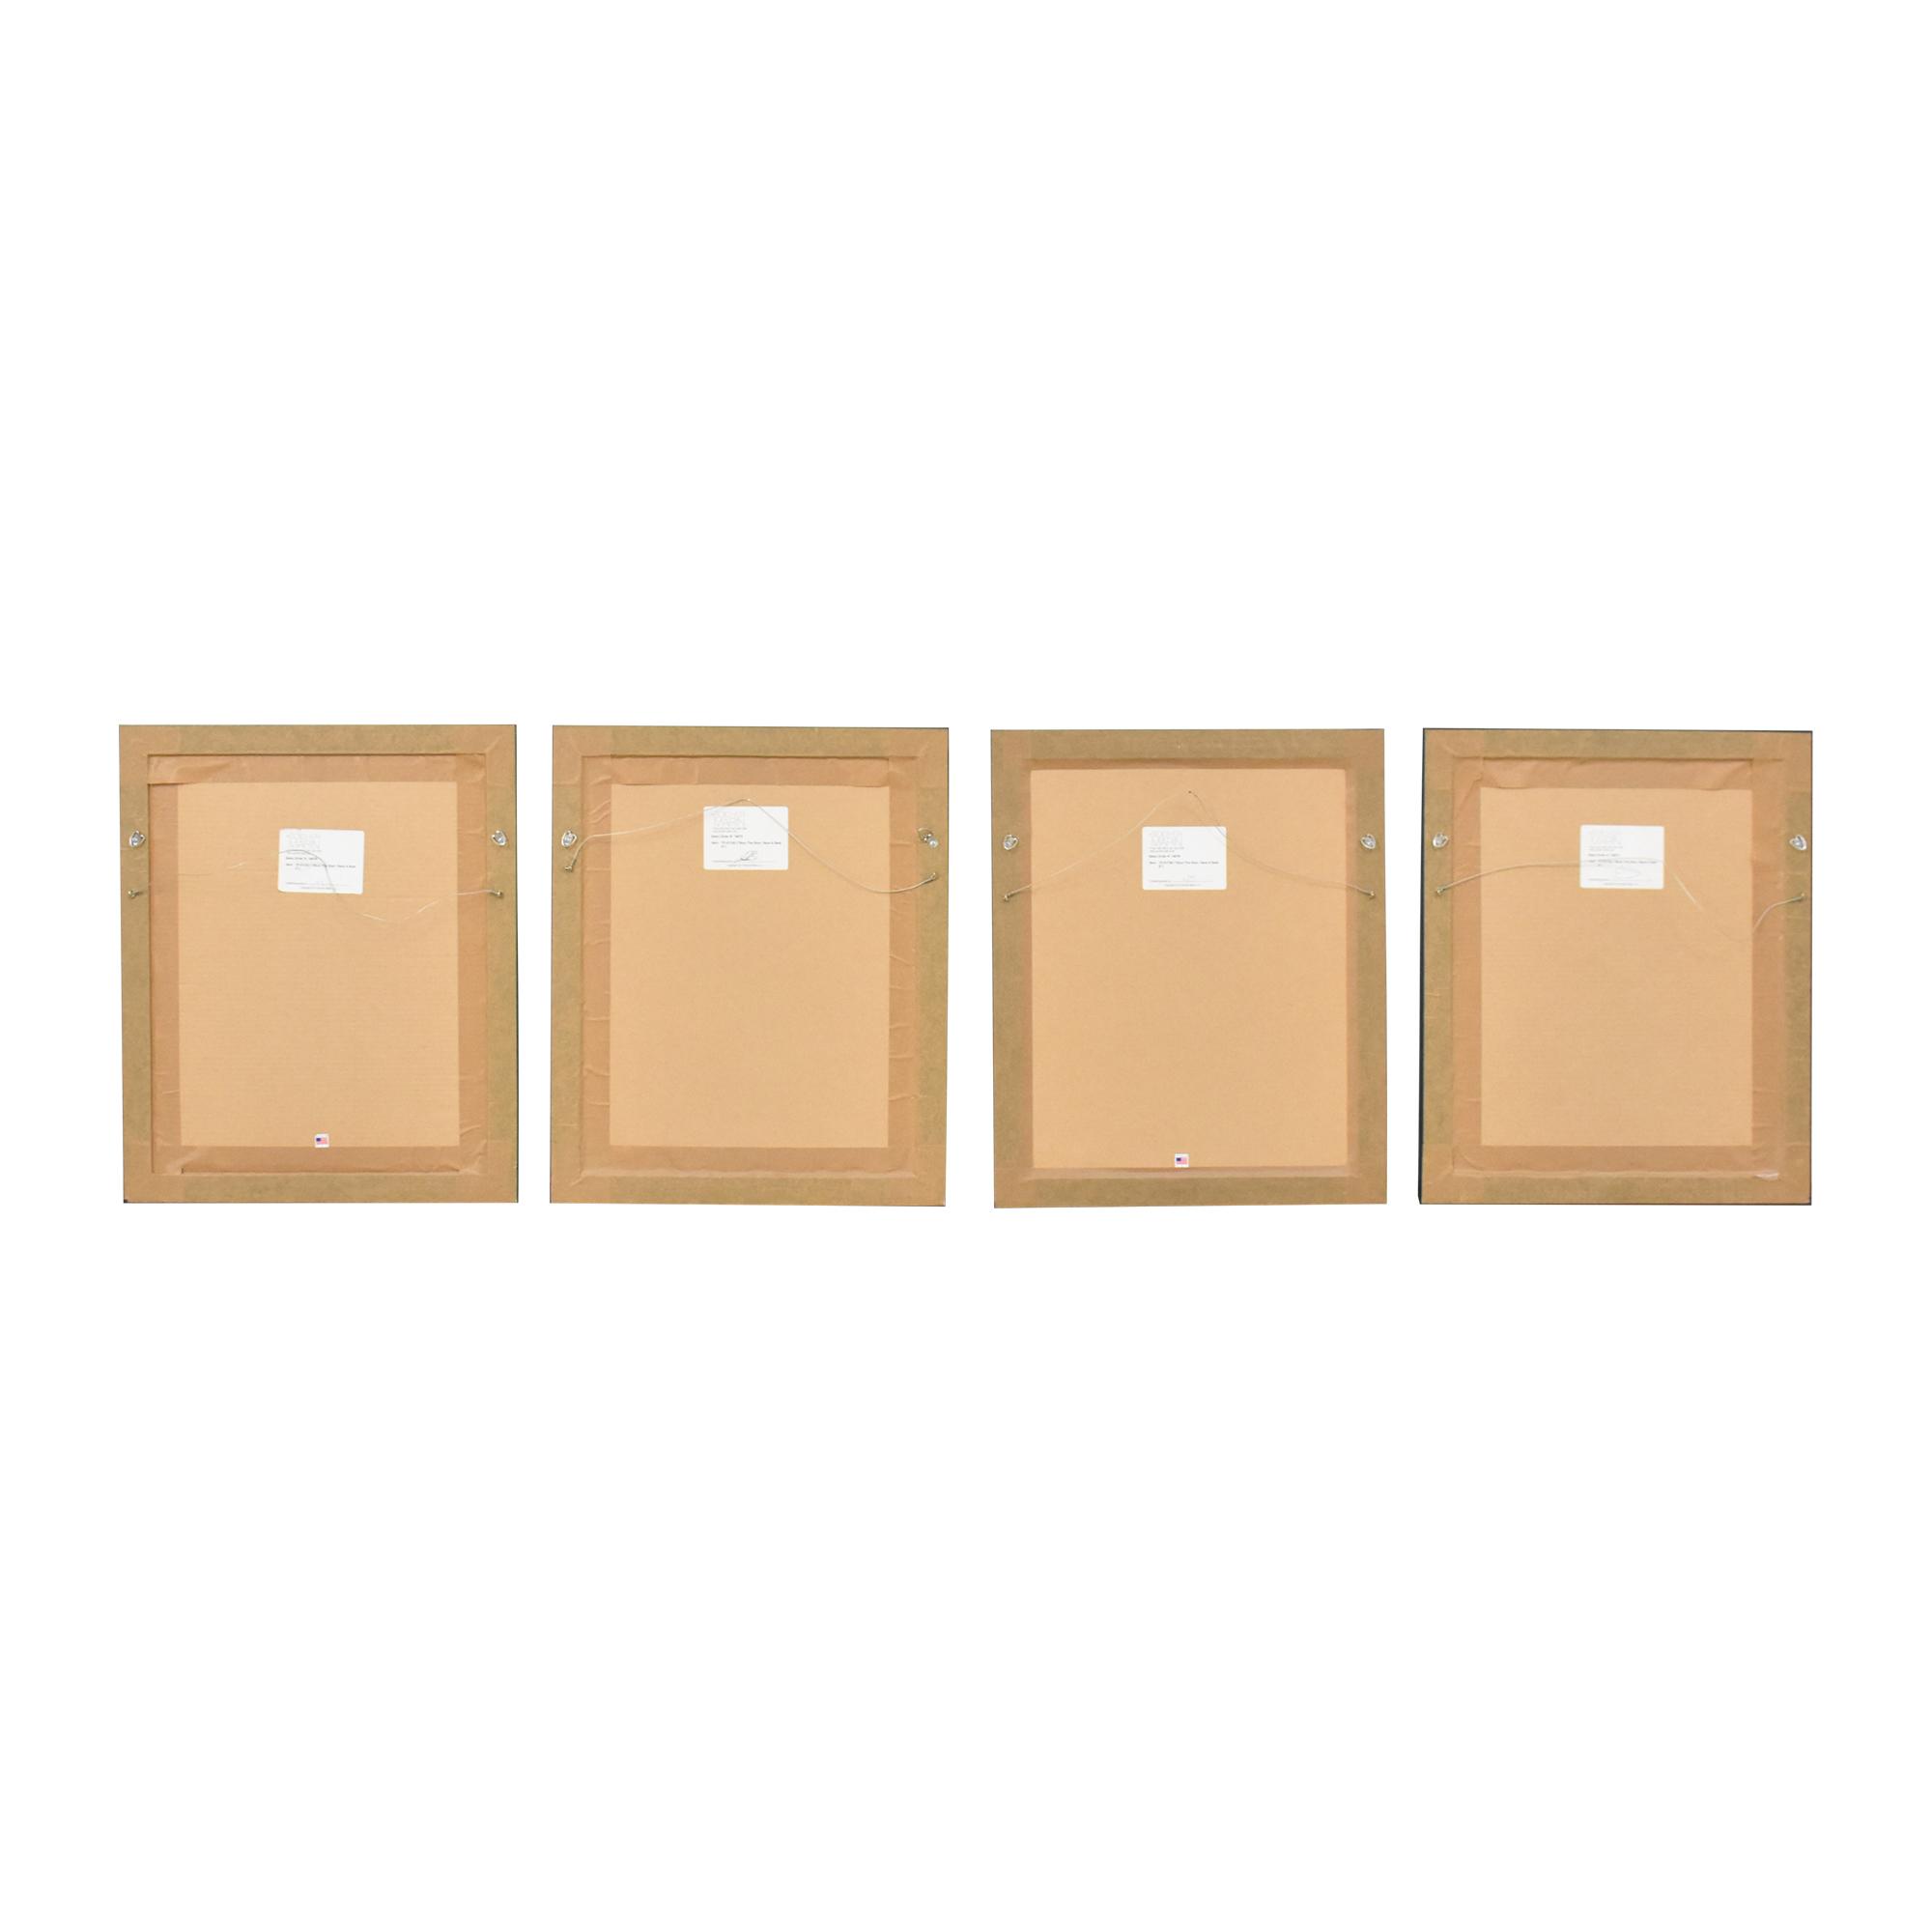 buy Soicher Marin Soicher Marin Shut the Door, Have a Seat Wall Art Series online